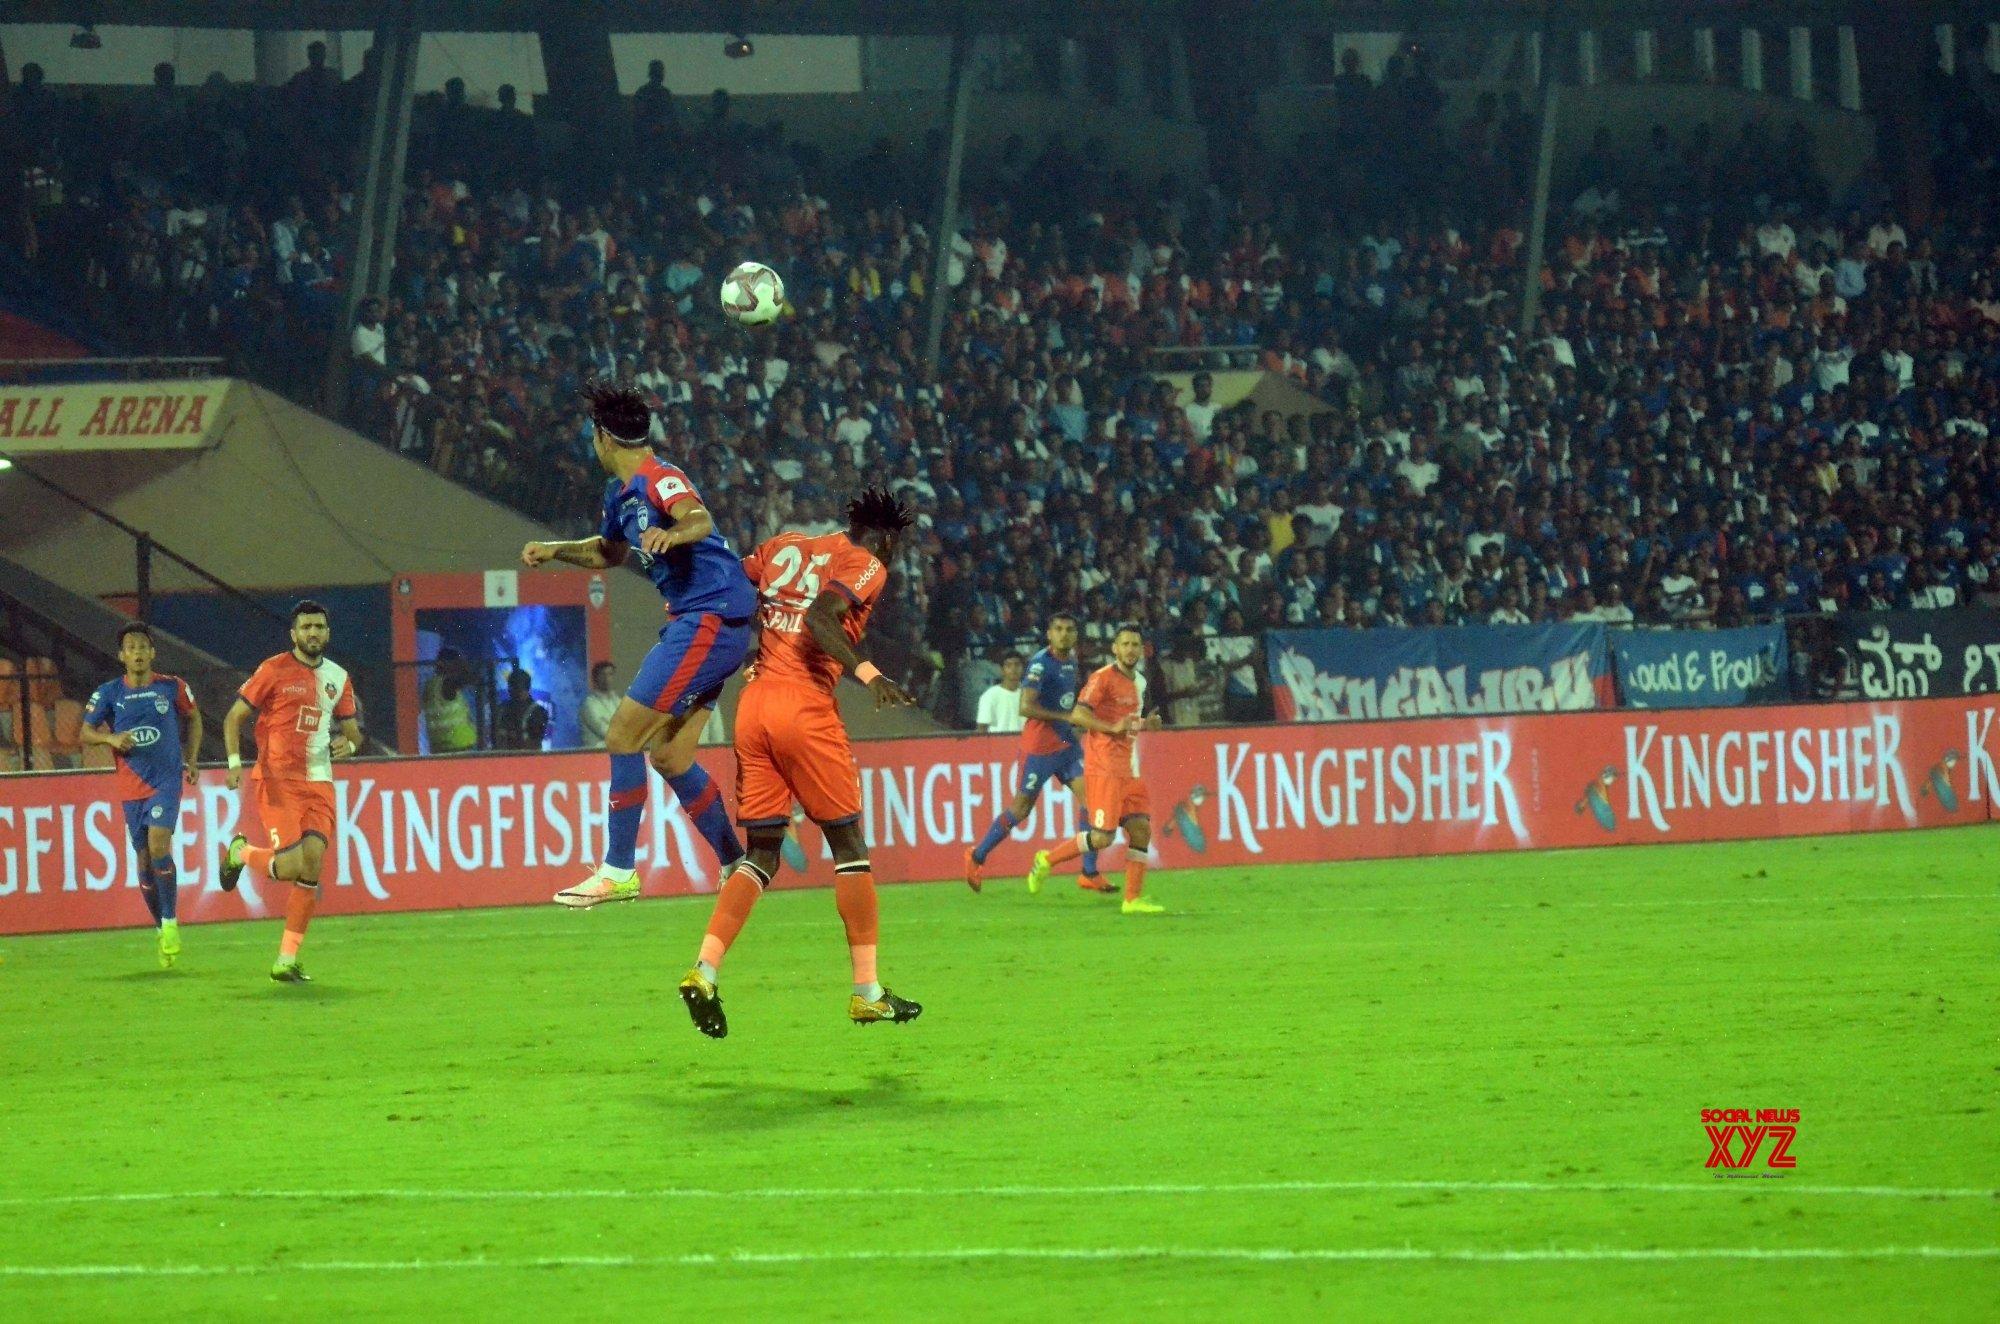 Bengaluru FC beat FC Goa to win maiden ISL title